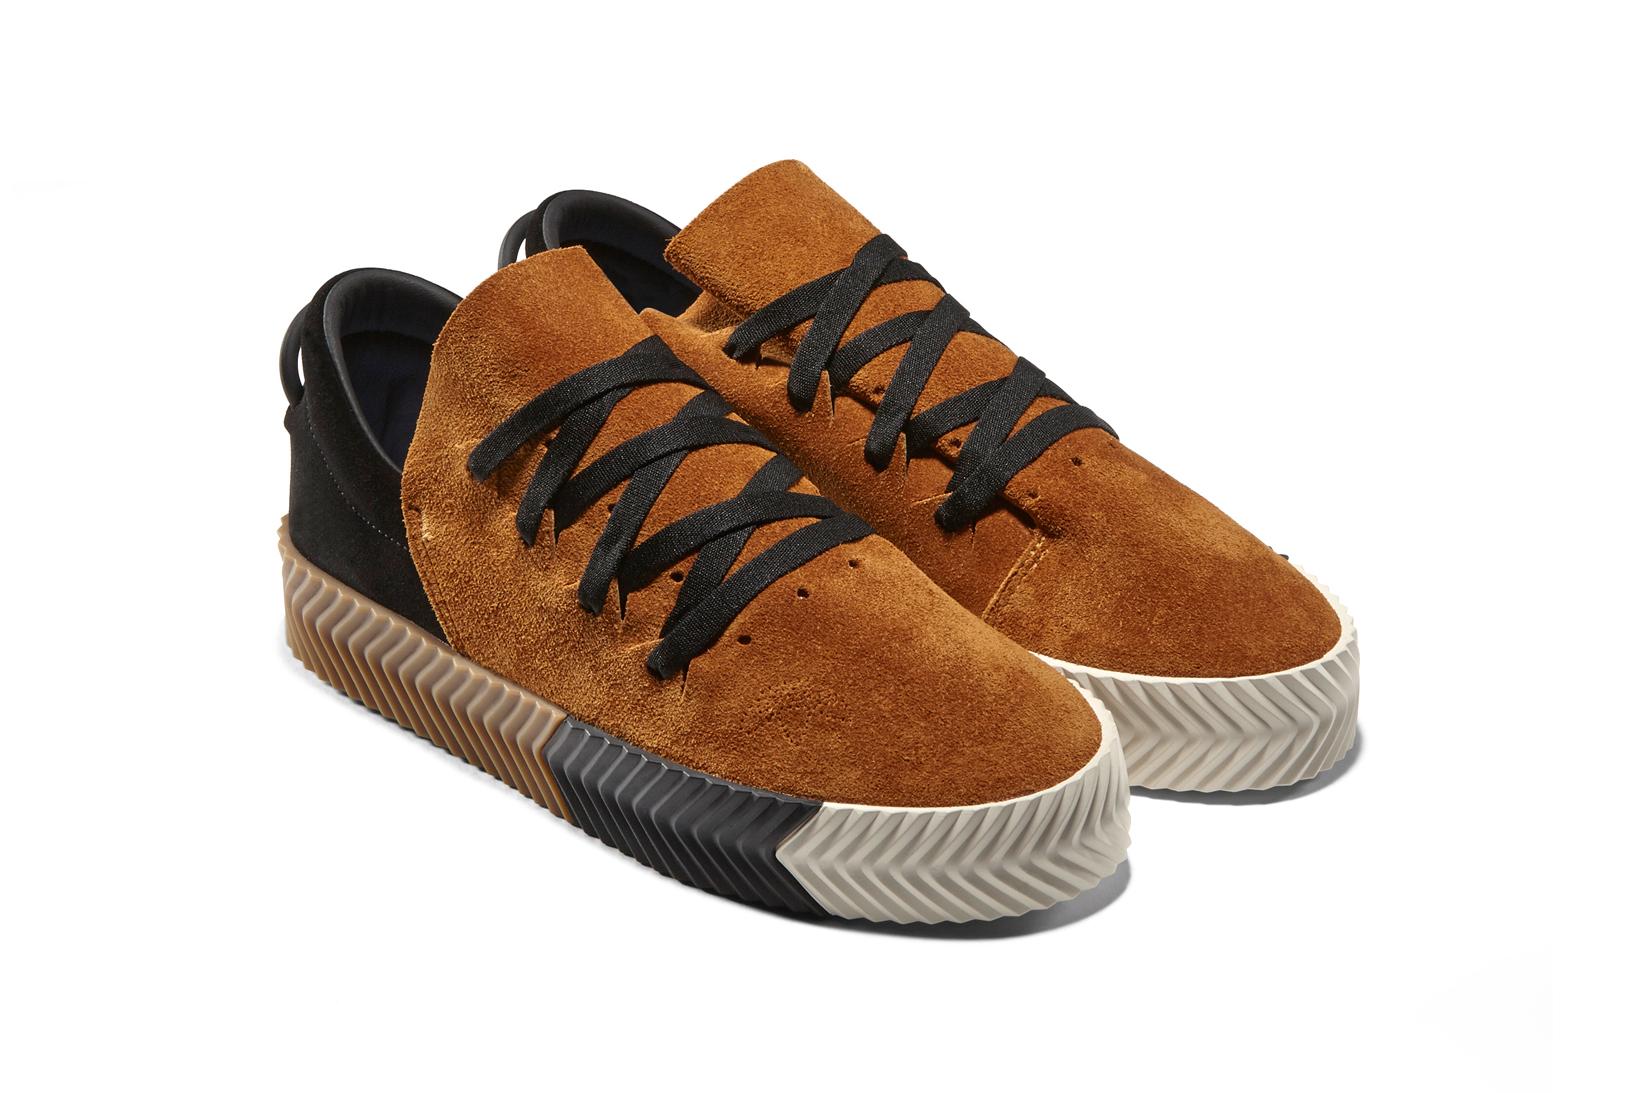 adidas Originals by Alexander Wang Skate Footwear Shoe Collection Low-top sneakers - 3769047